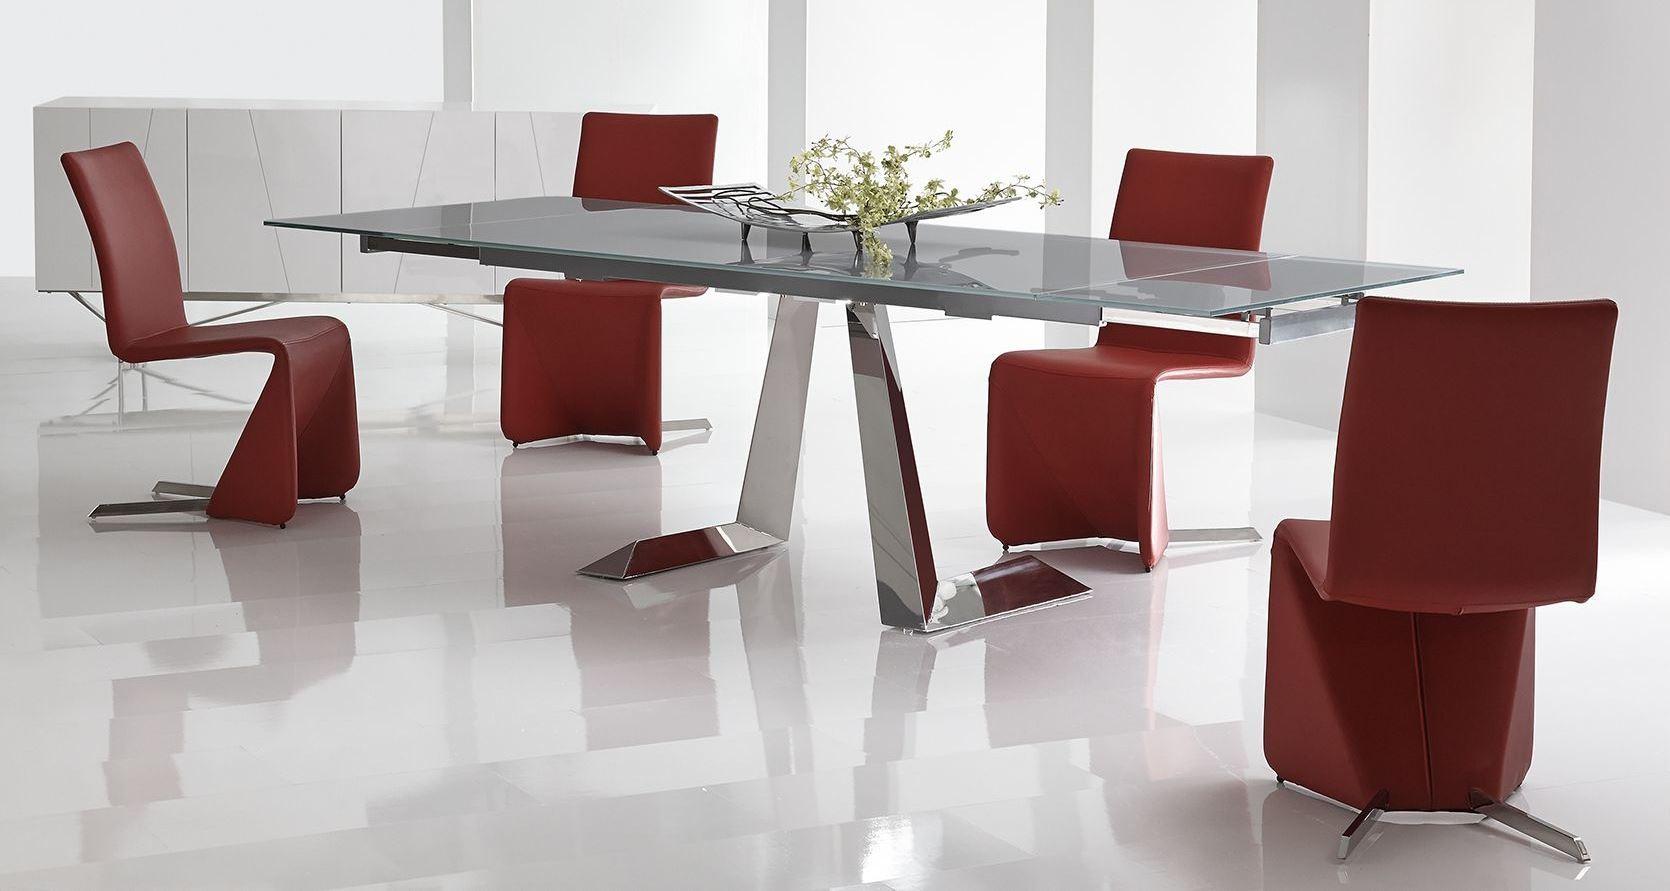 Tessa Grey Extendable Rectangular Dining Room Set from  : 2btessatbbernicech from colemanfurniture.com size 1670 x 891 jpeg 151kB